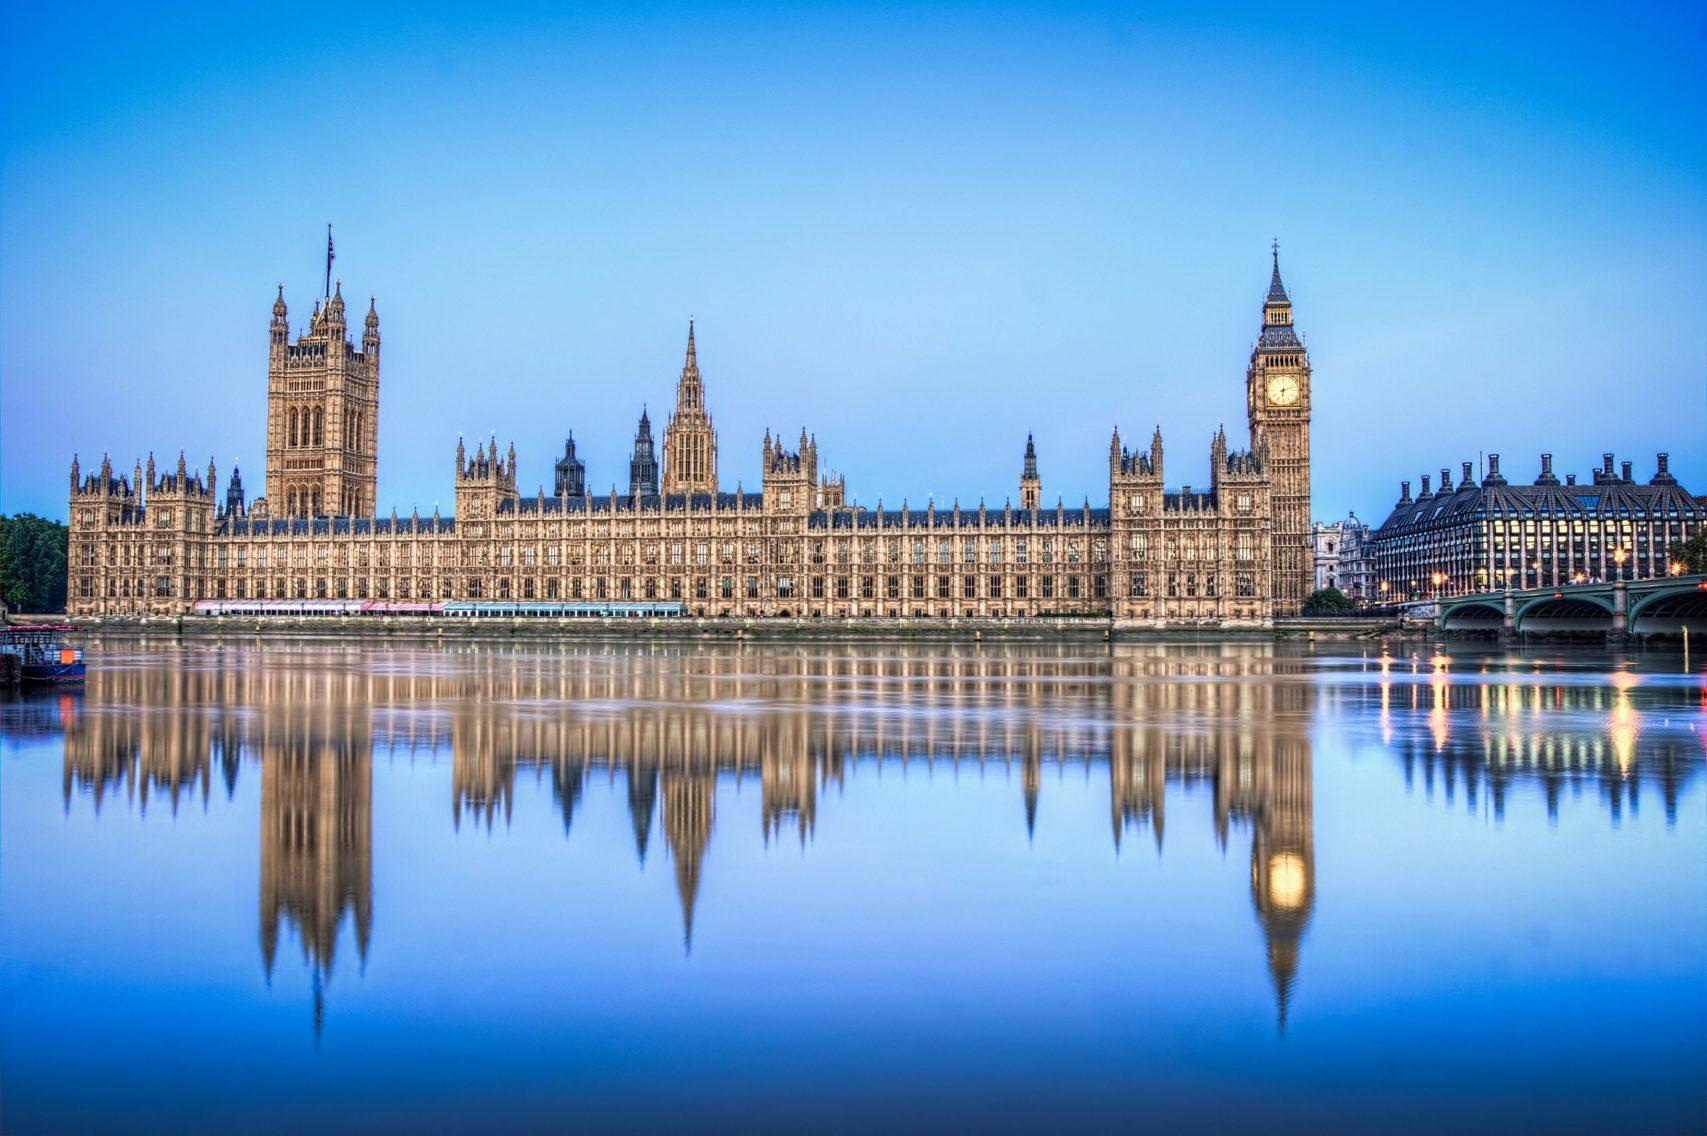 Parliament   BEAUTIFUL IMAGE